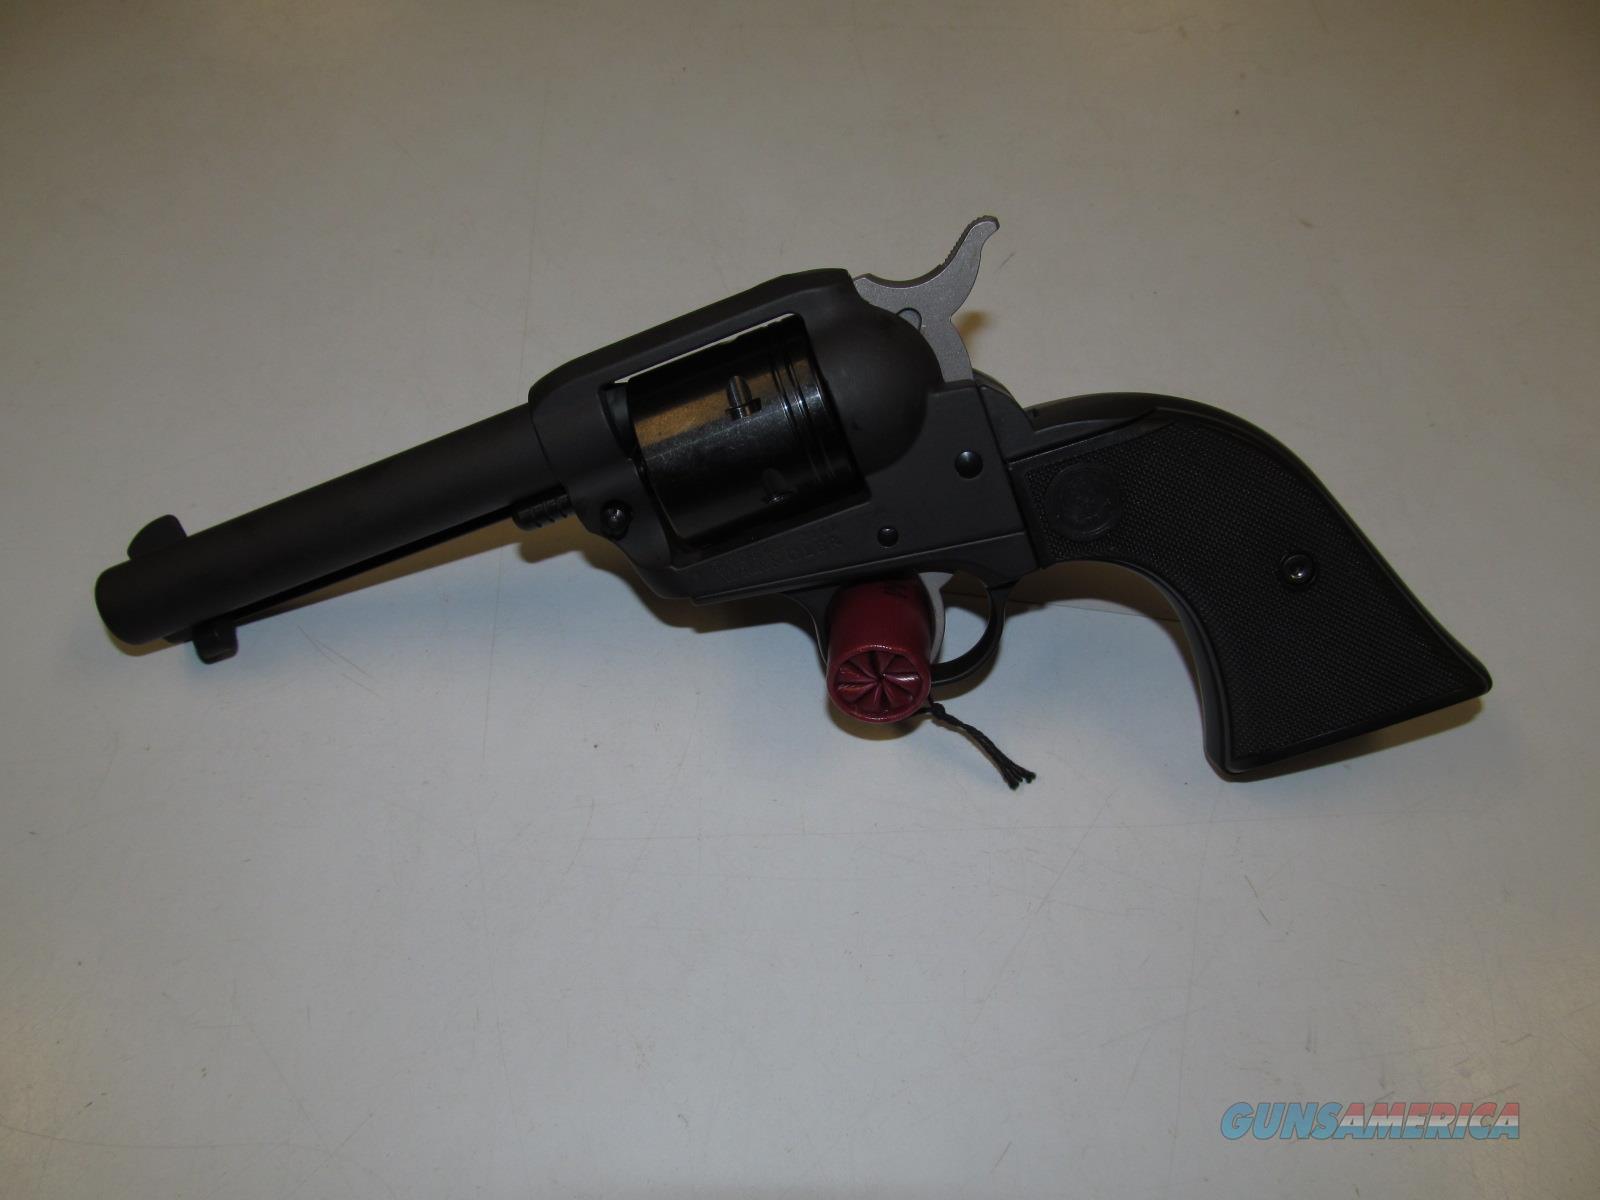 Ruger Wrangler (02002)  Guns > Pistols > Ruger Single Action Revolvers > Cowboy Action